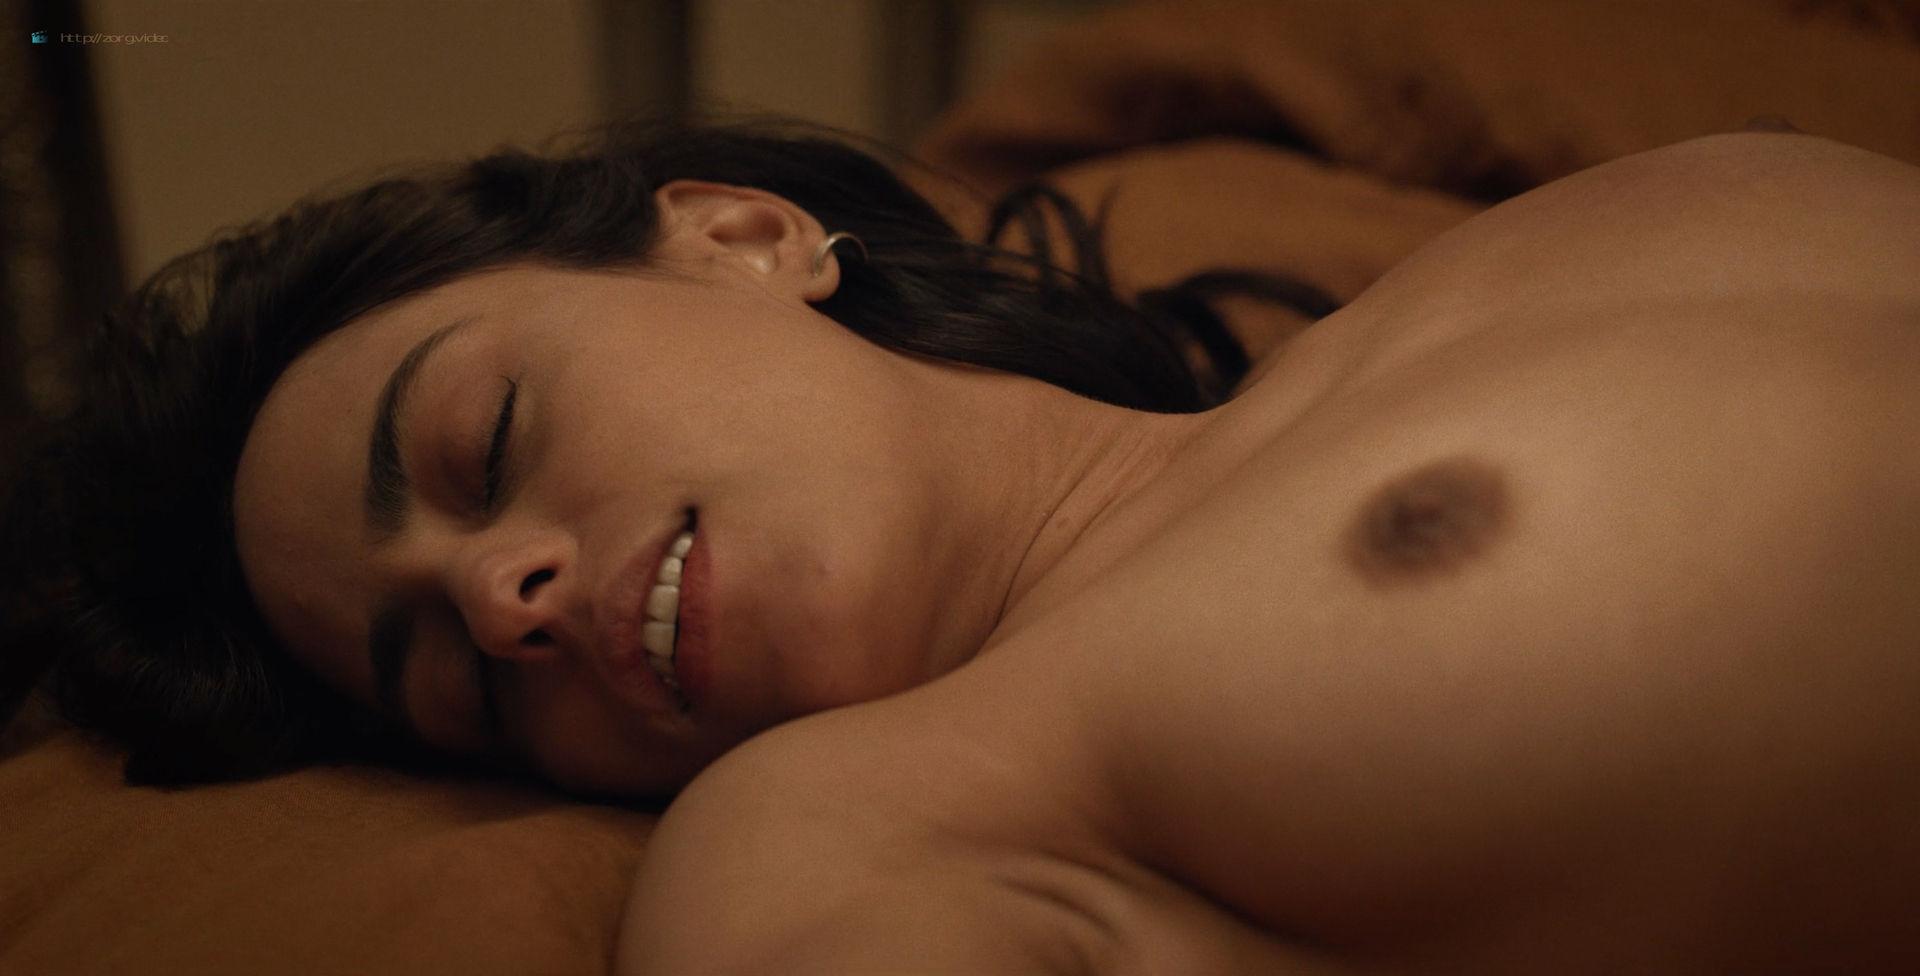 Ana Layevska nude lesbian sex with Florencia Ríos - Yankee (2019) S1 HD 1080p (7)